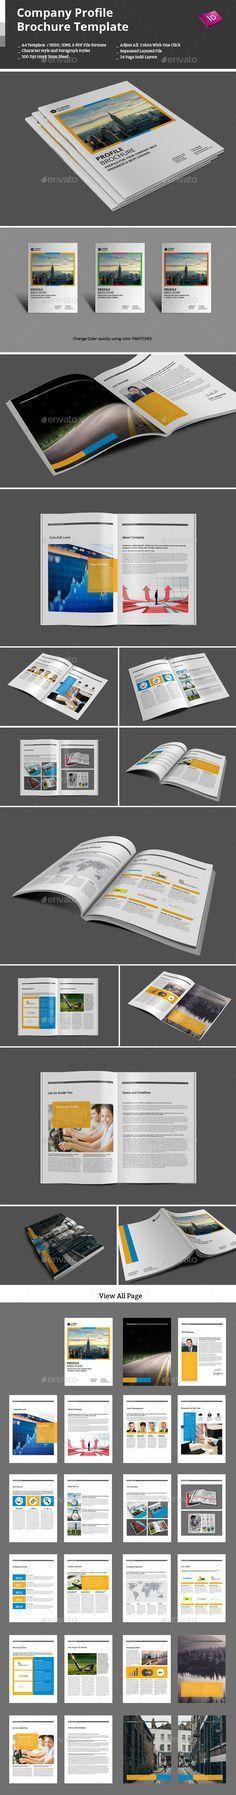 Multipurpose Company Profile Template | Company profile, Brochures ...